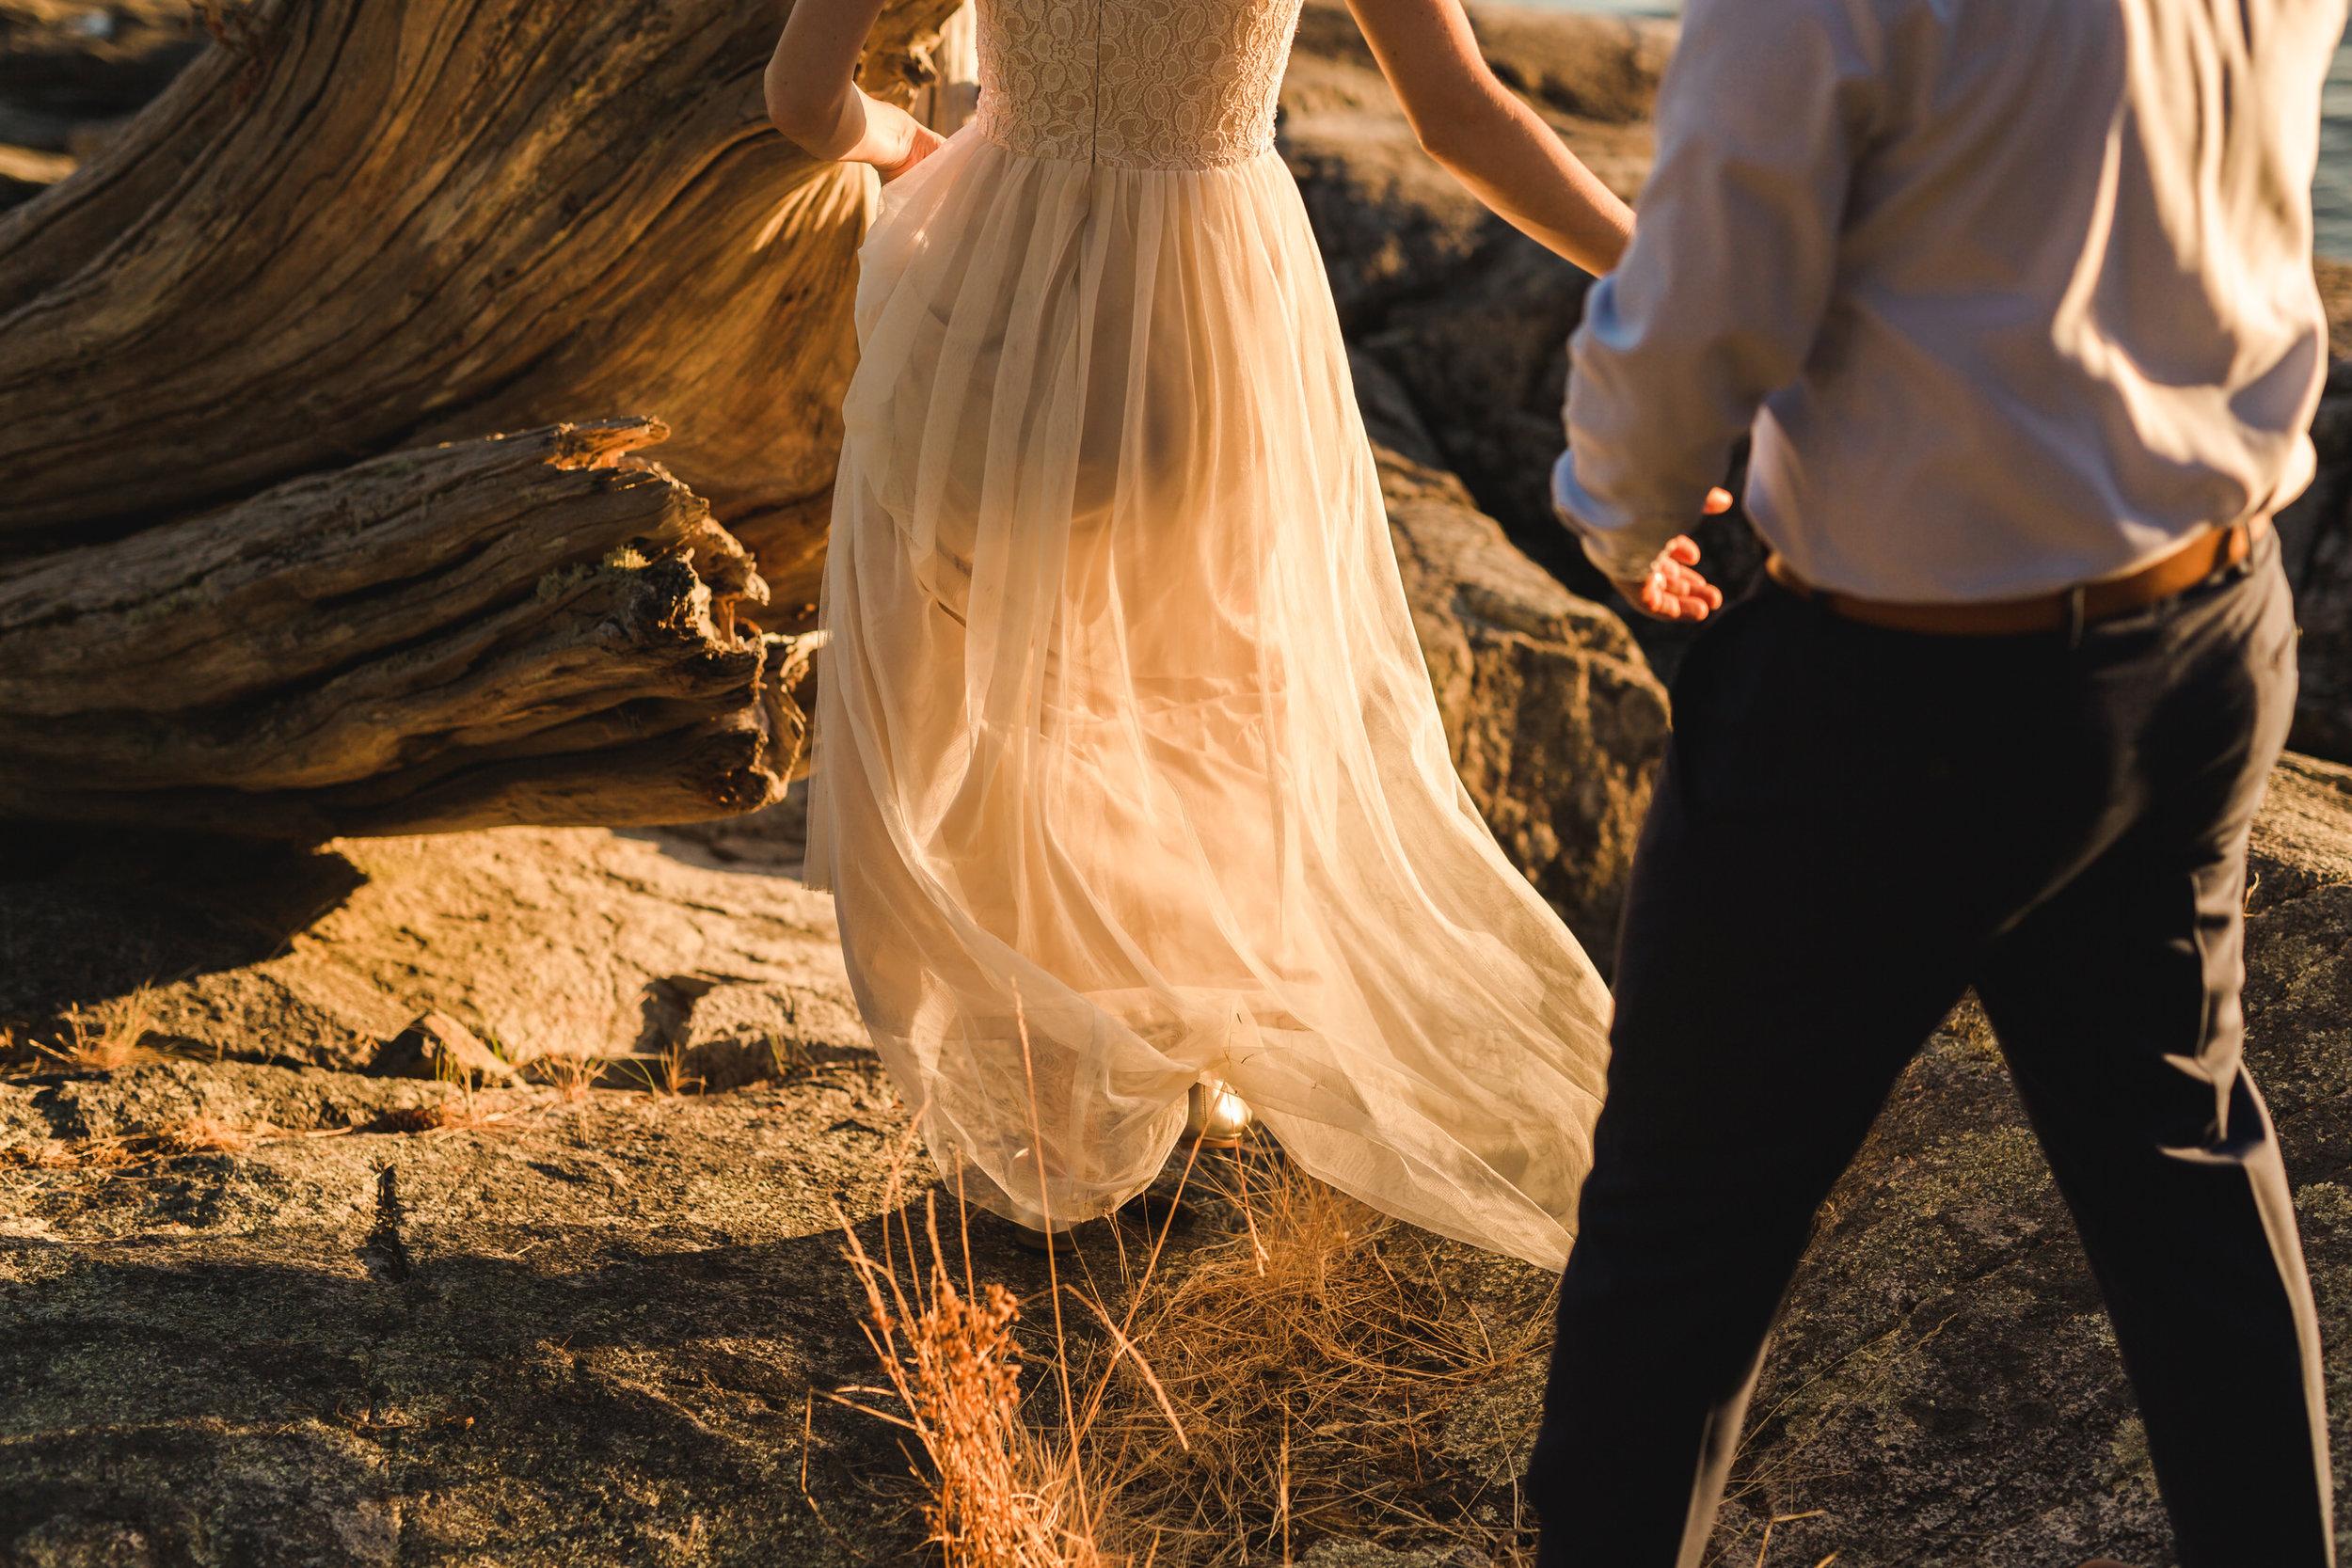 Rockwater Secret Cove Resort Wedding - Sunshine Coast BC Wedding Photographer - Vancouver Wedding Photographer - Sunshine Coast Elopement Photos - IMG_1727.jpg